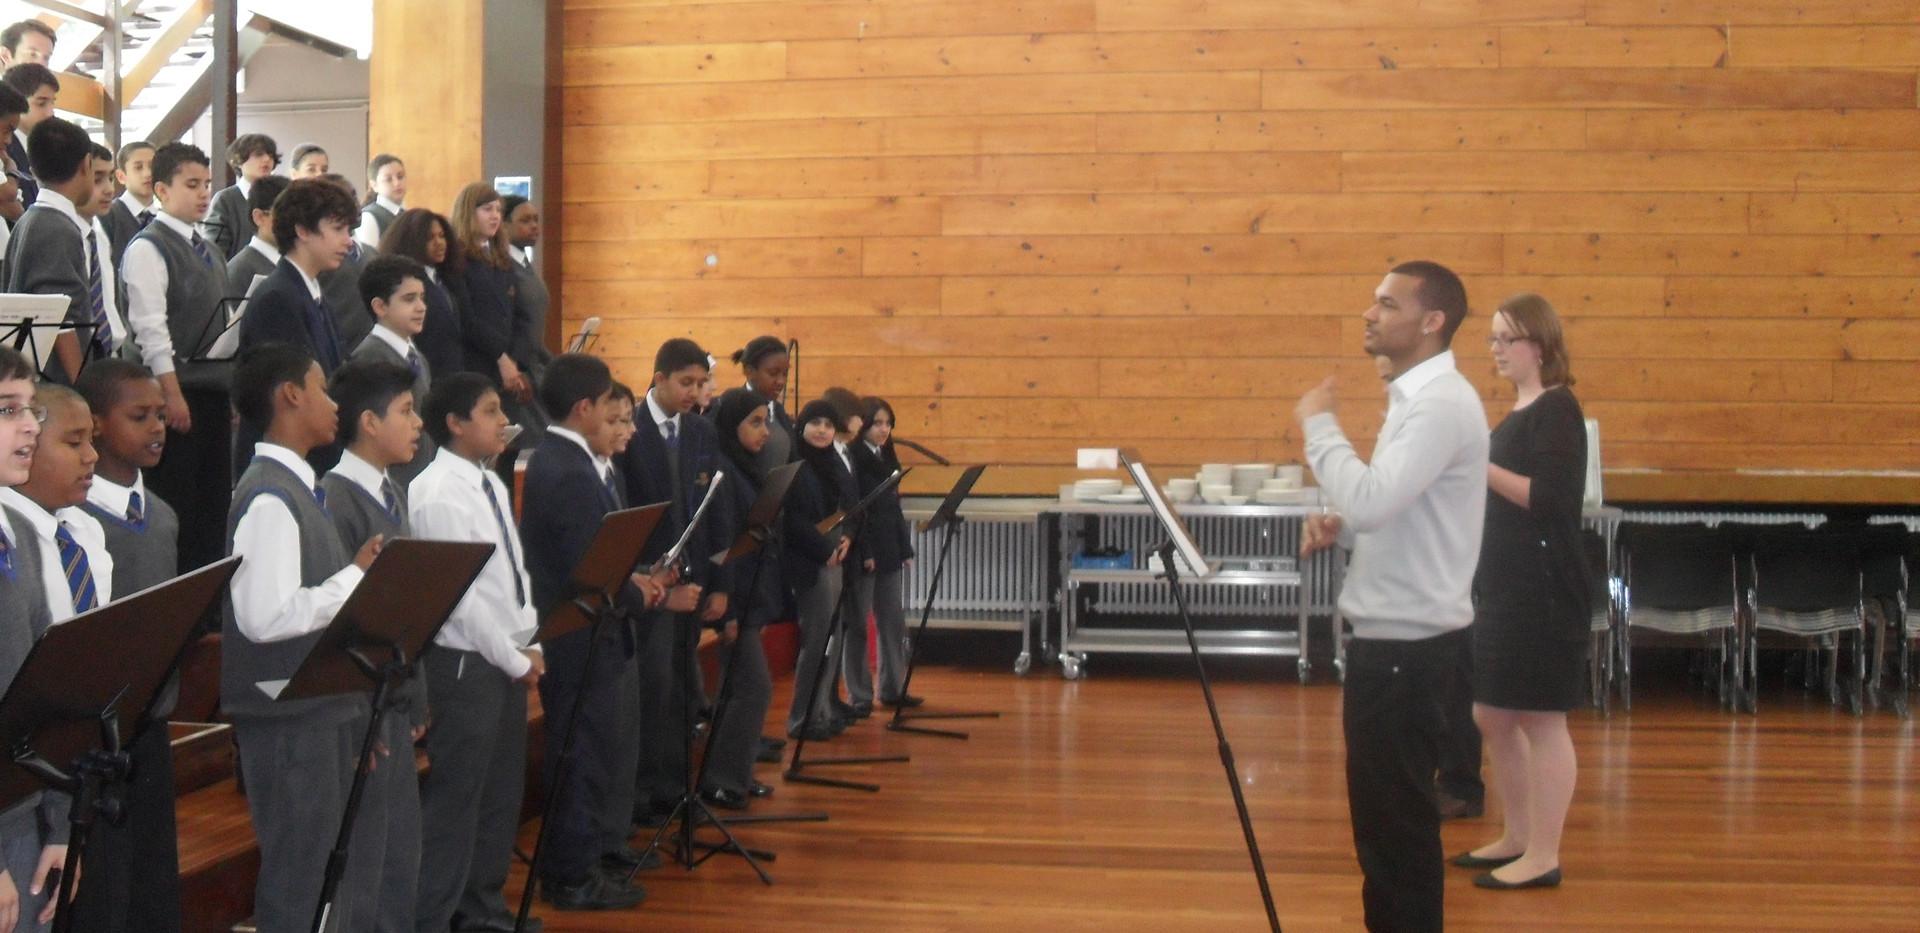 Mr Gold's School Workshop